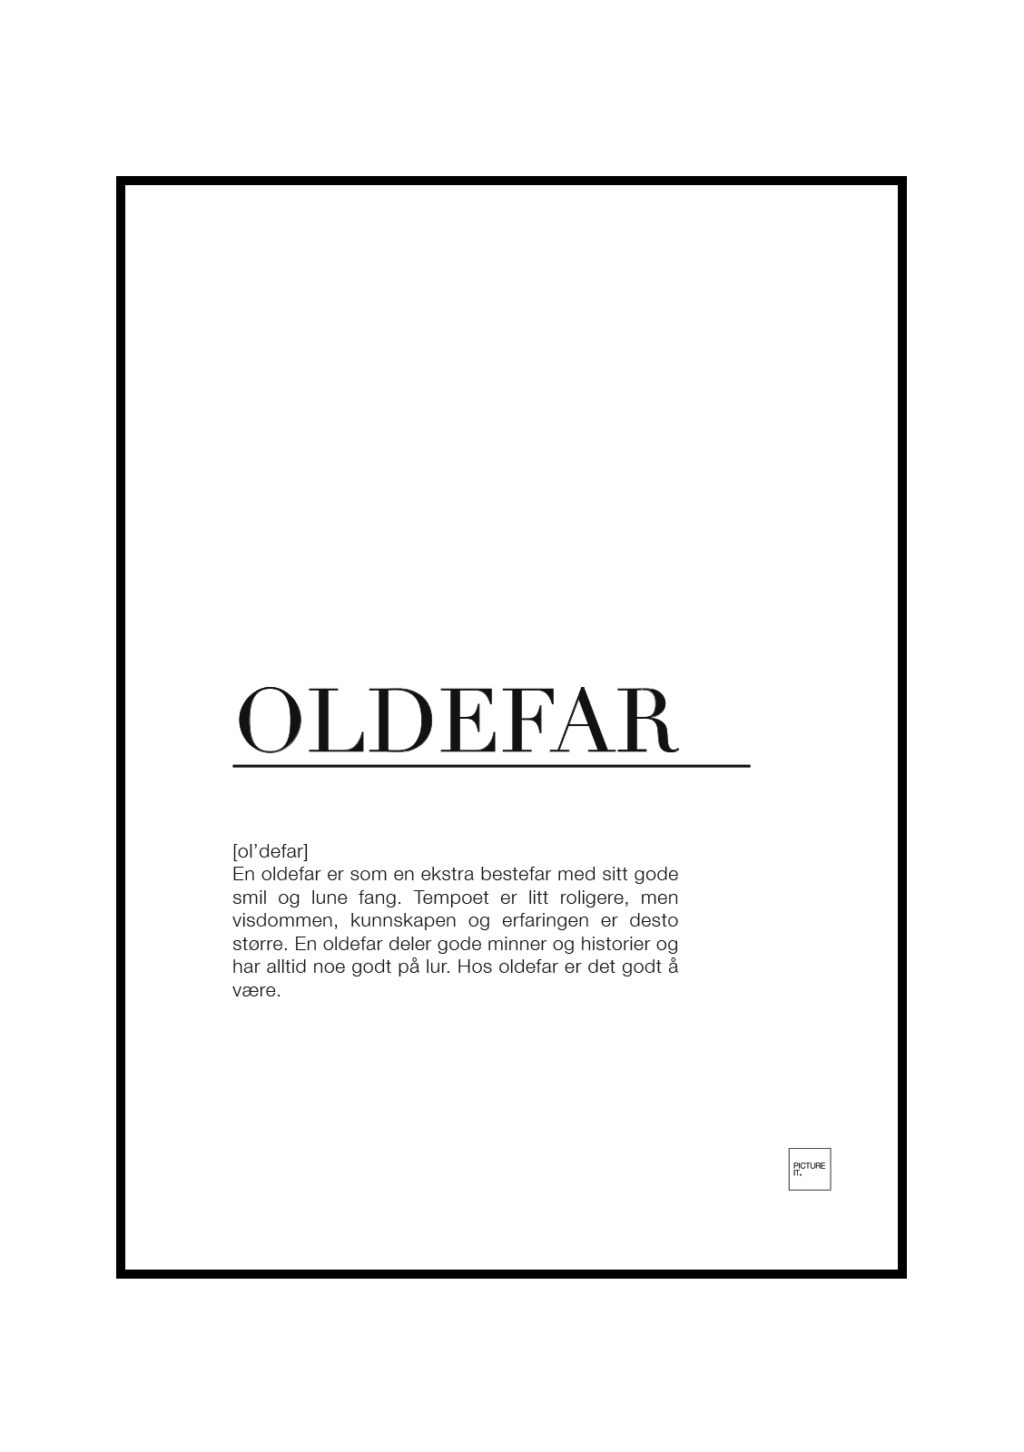 oldefar poster